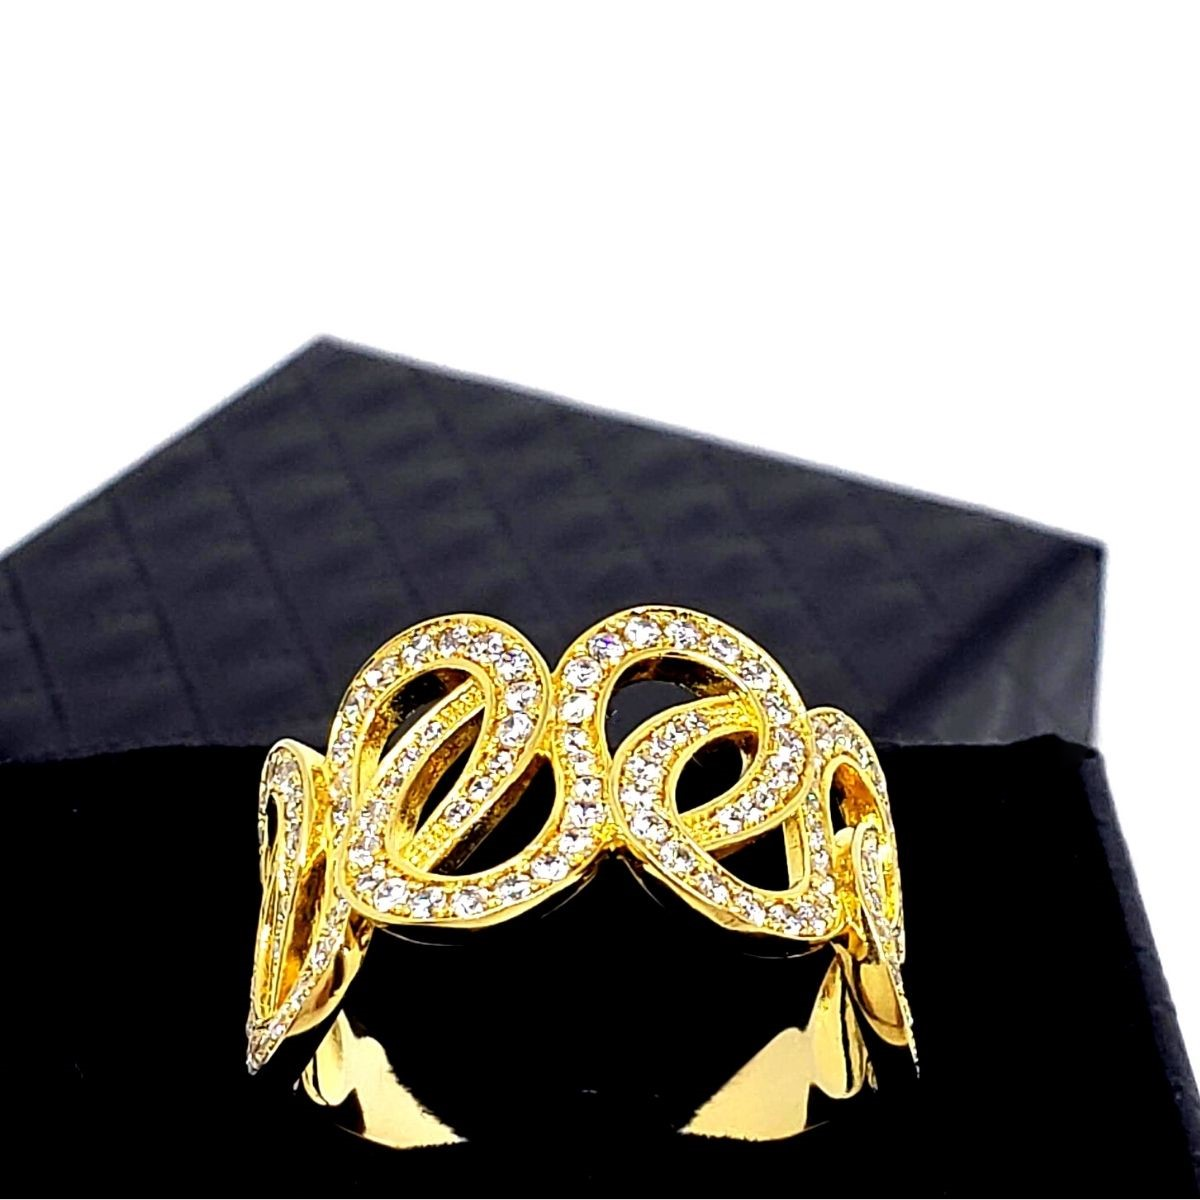 Anel Infinito Entrelace Cravejado Zirconias Banho De Ouro 18k 1435